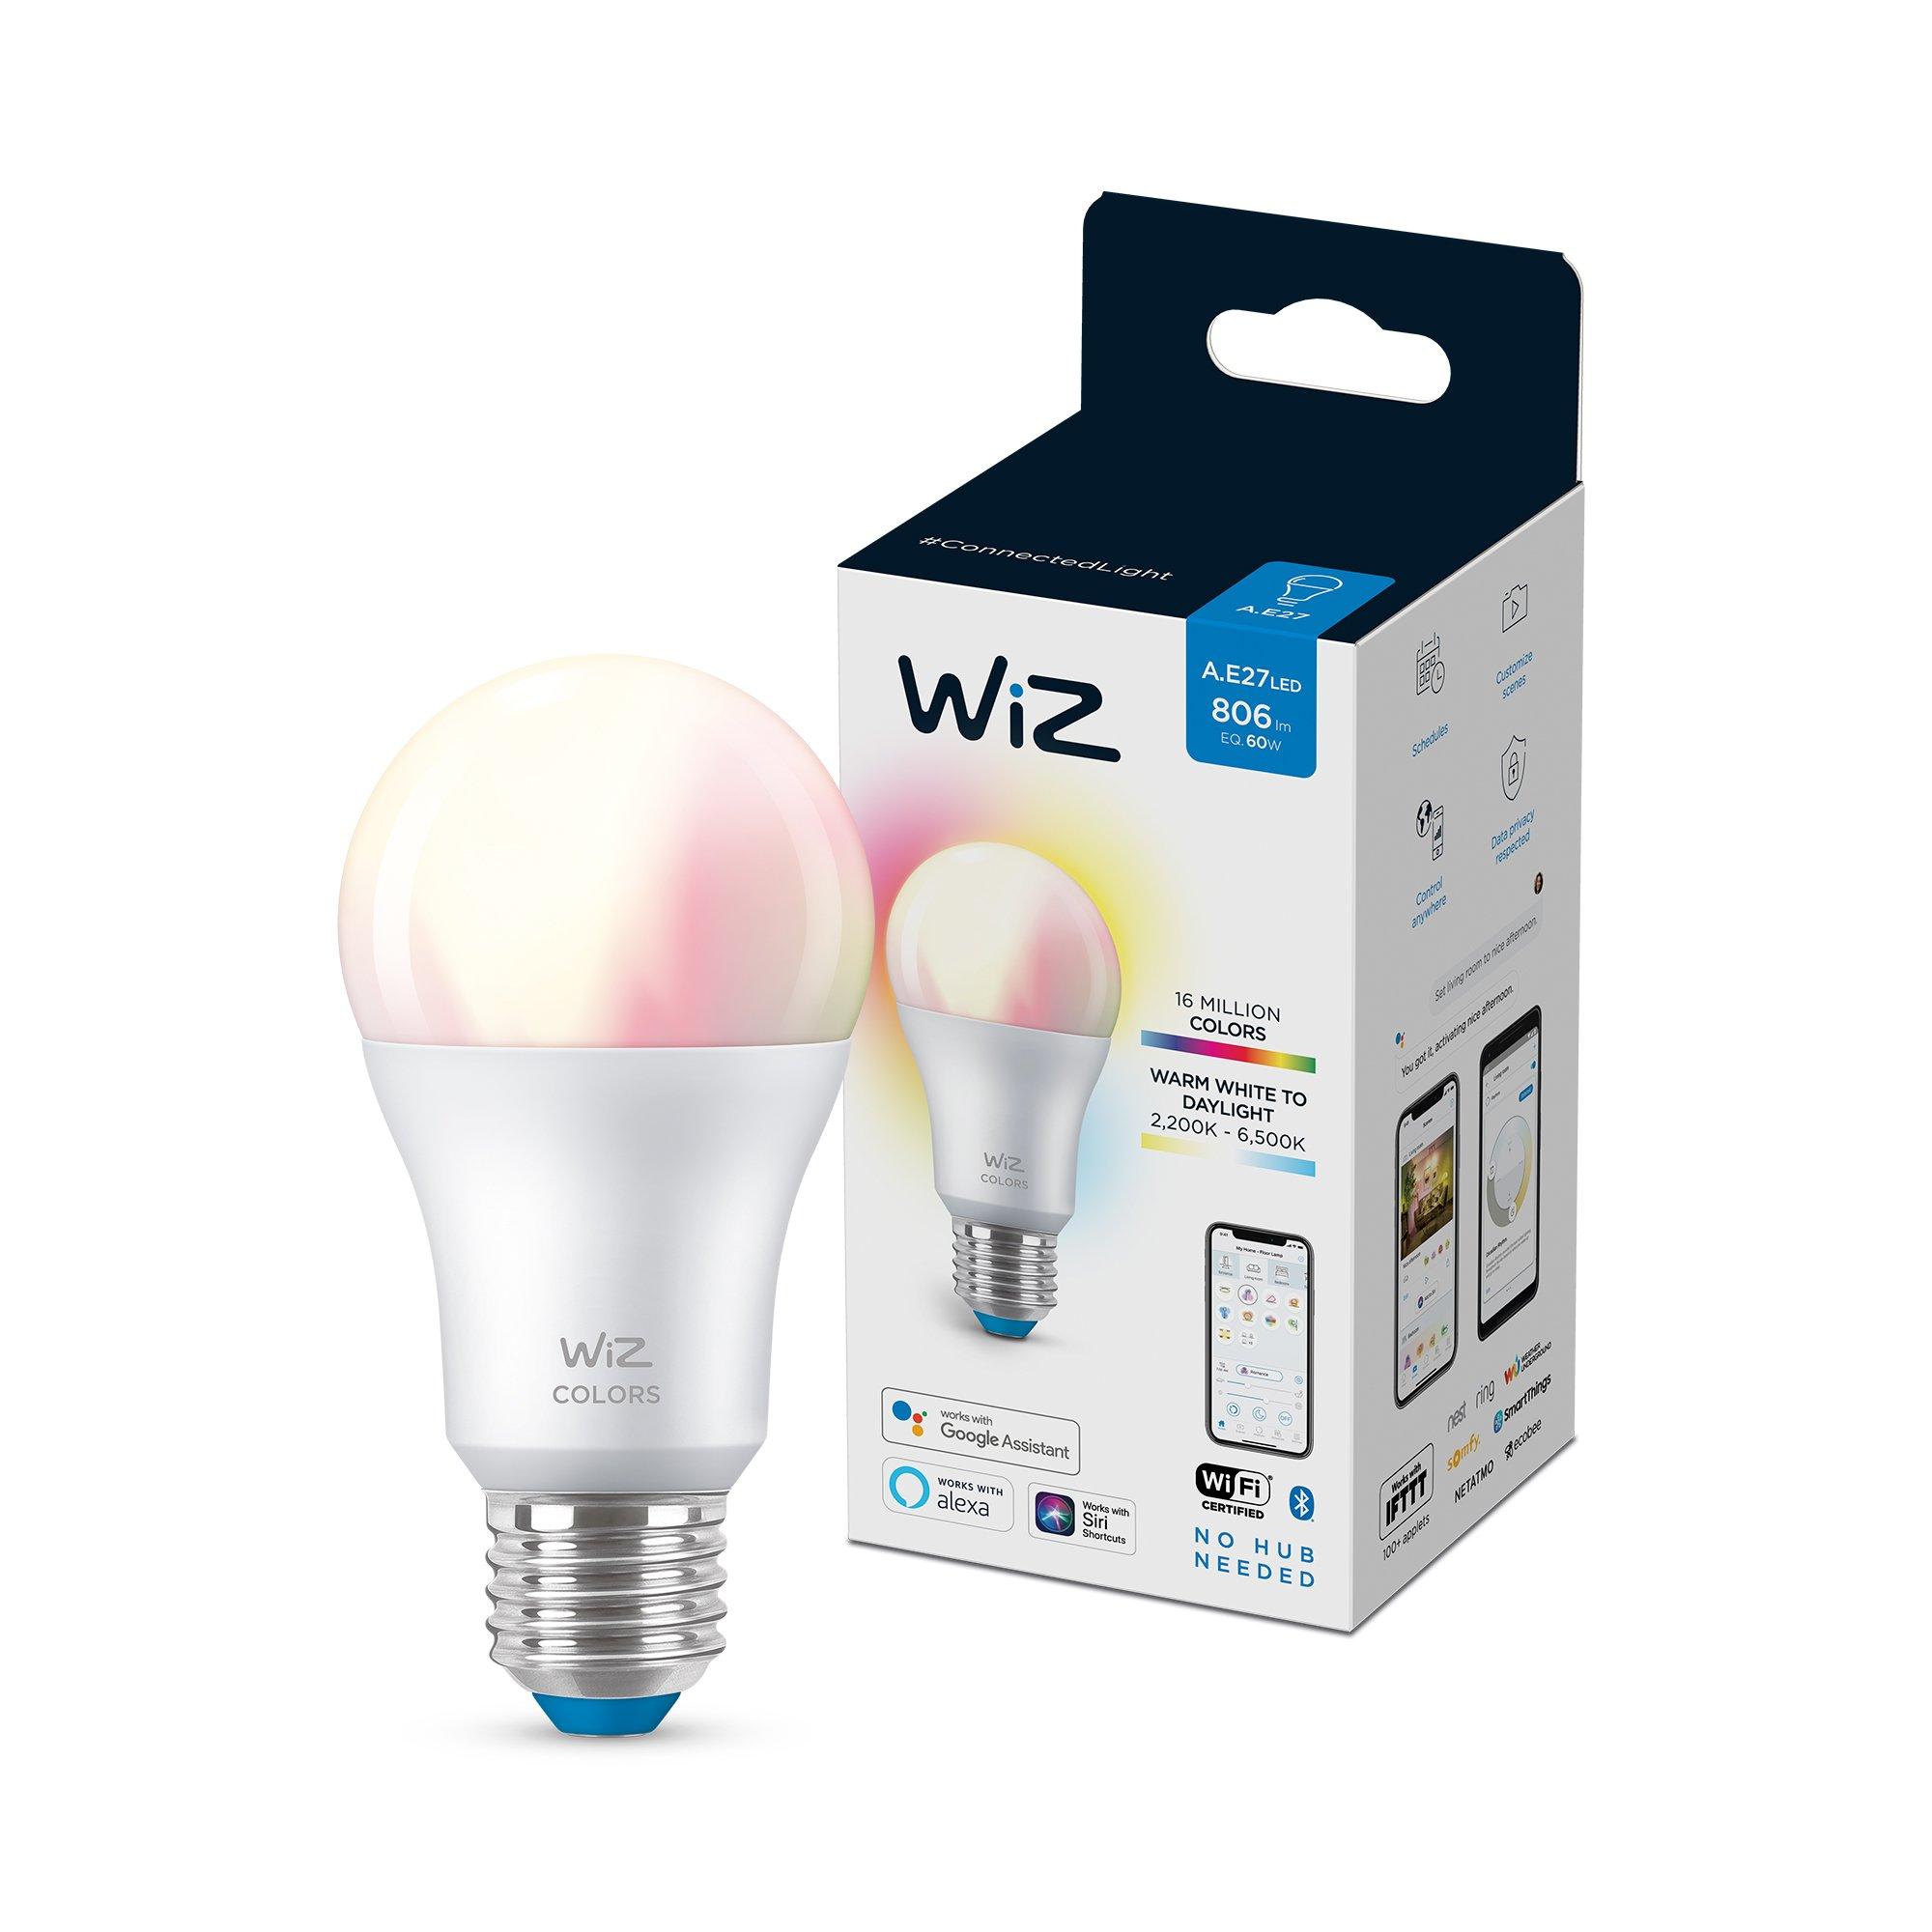 WiZ - A60 E27 Colour and Tunable White - Smart Home